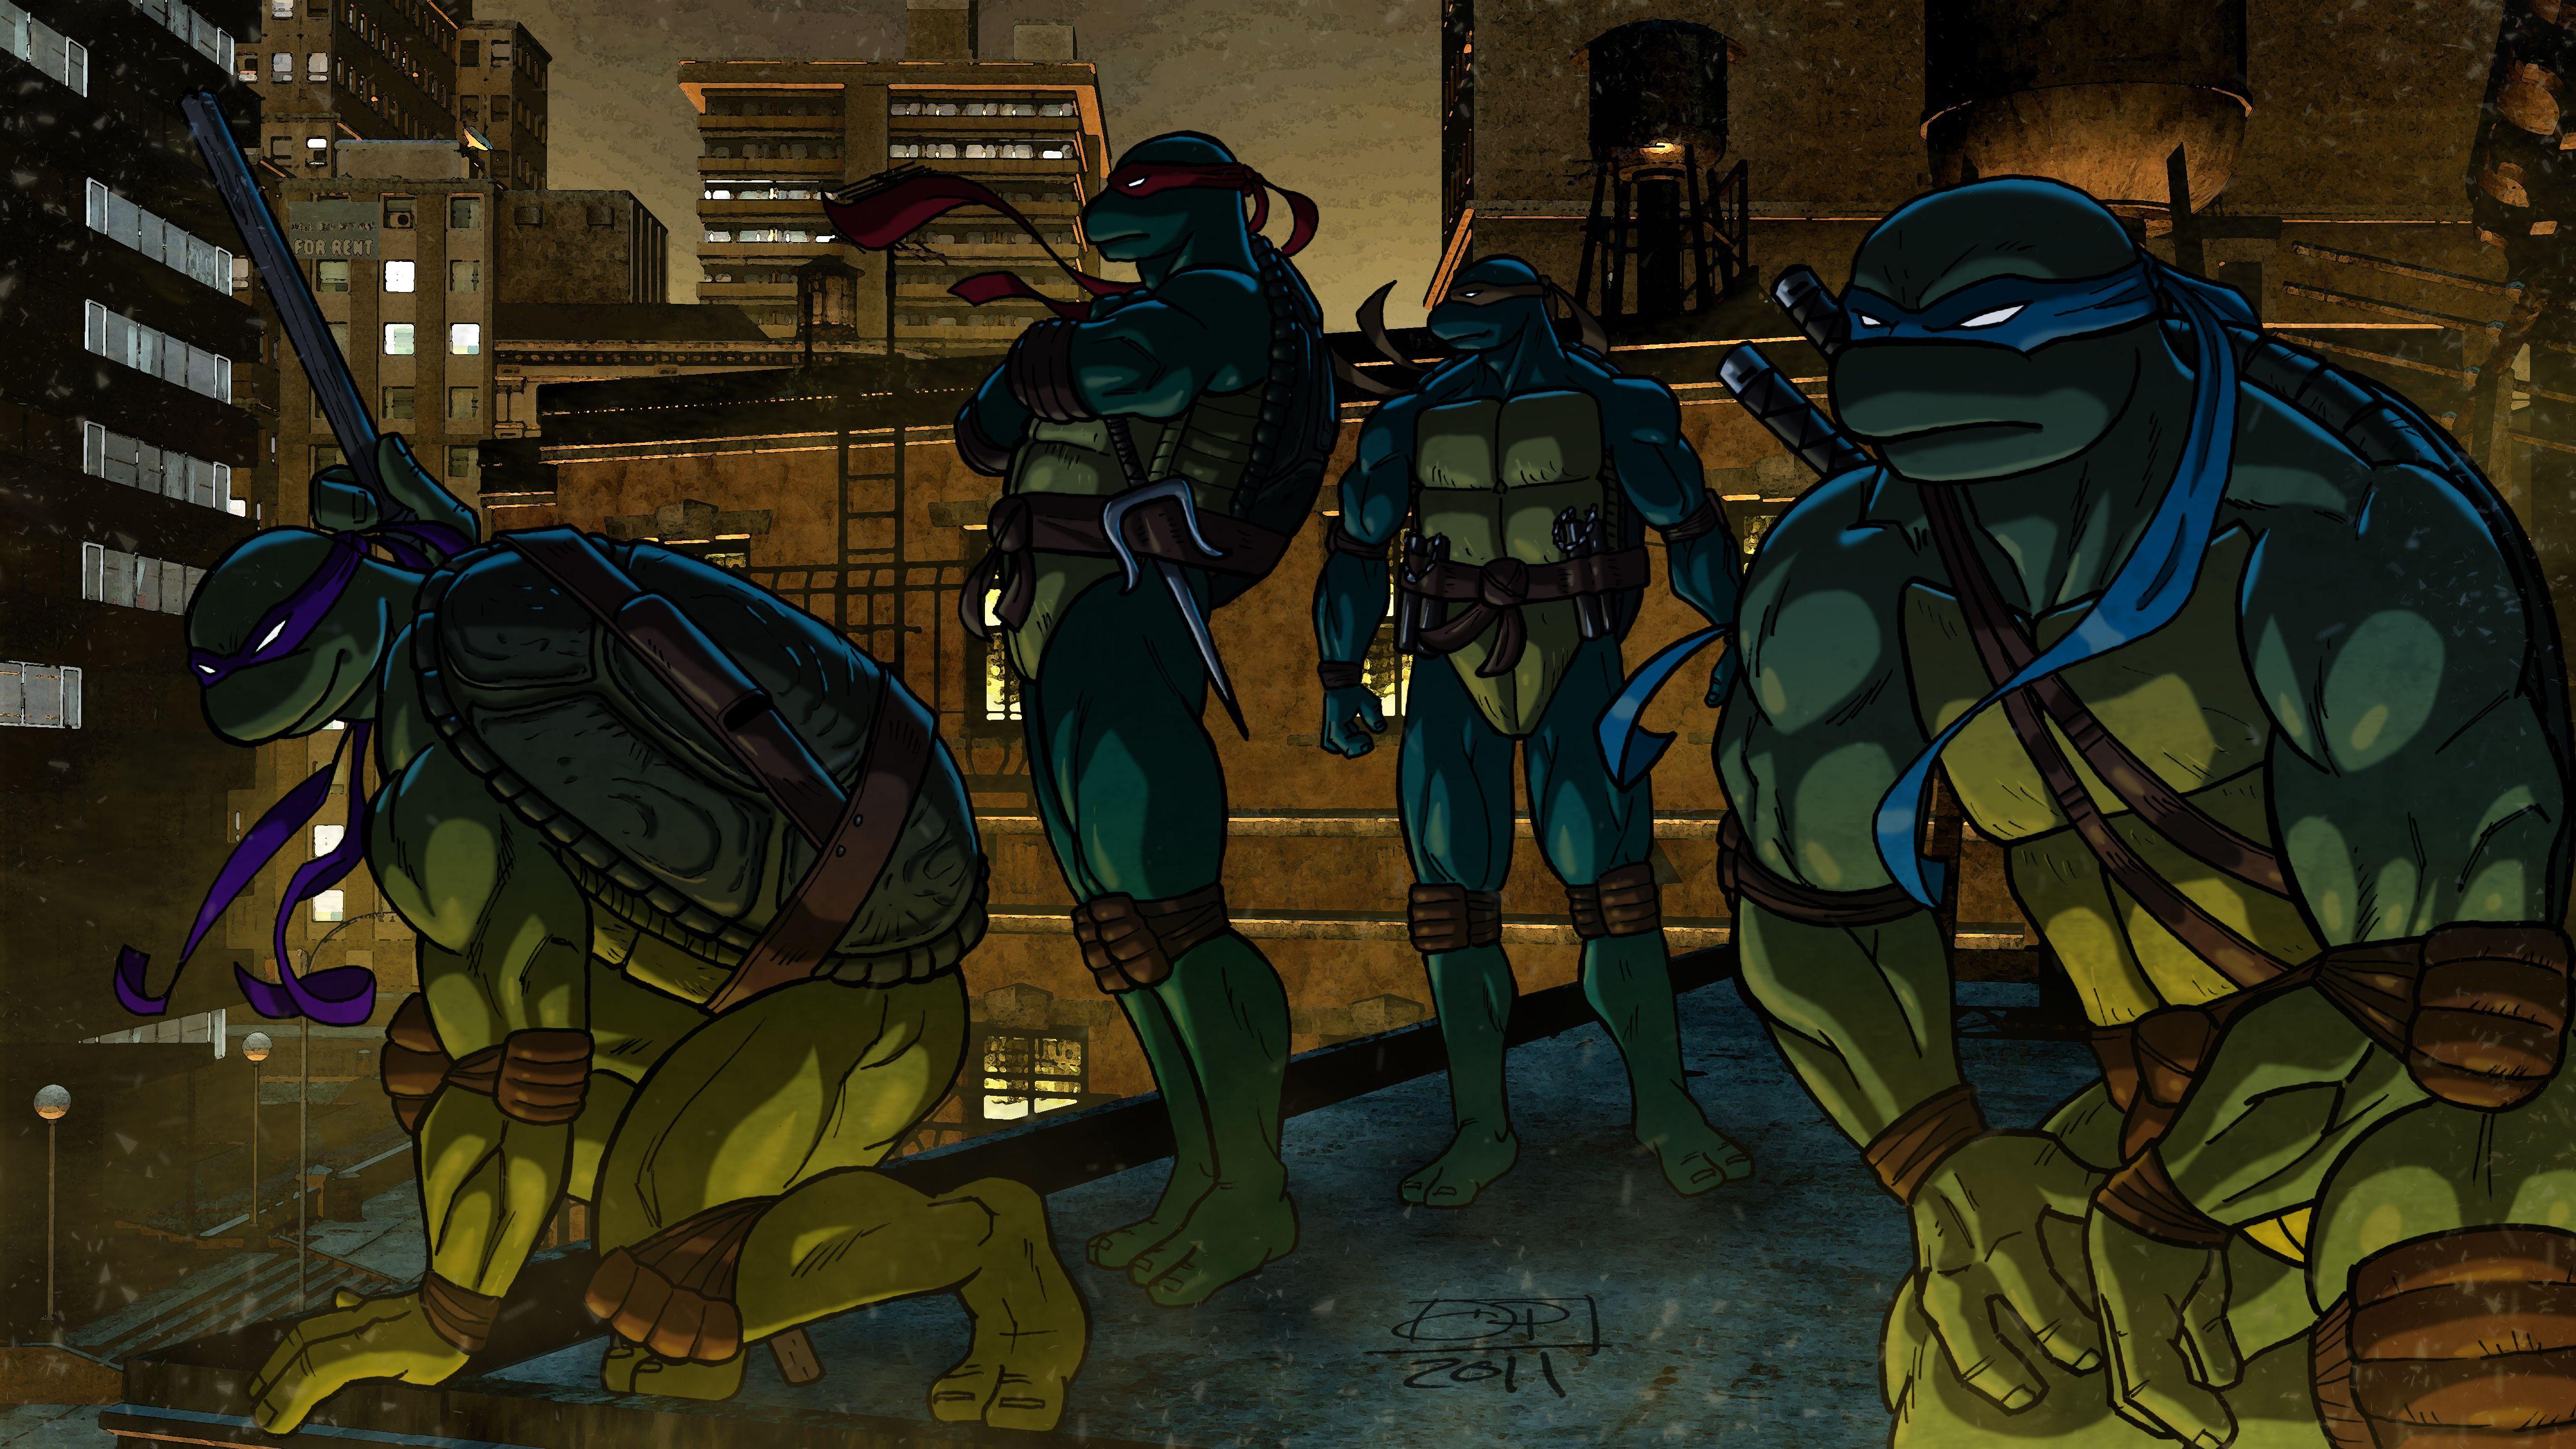 Wallpapers Ninja Turtles Posted By Sarah Johnson